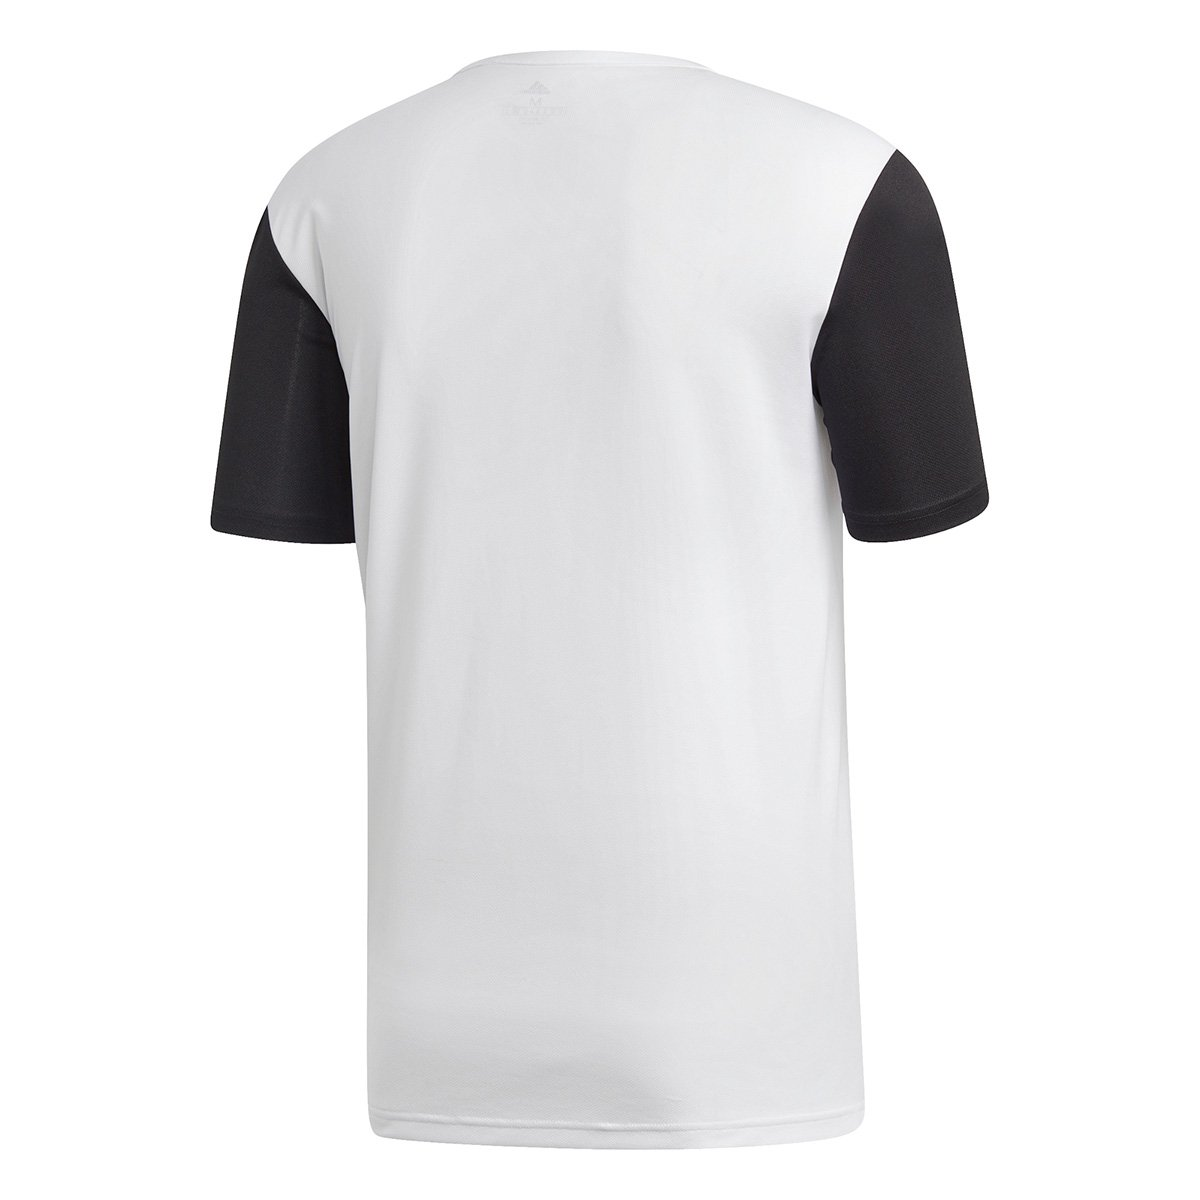 Camisa Estro 19 Adidas Masculina - 1